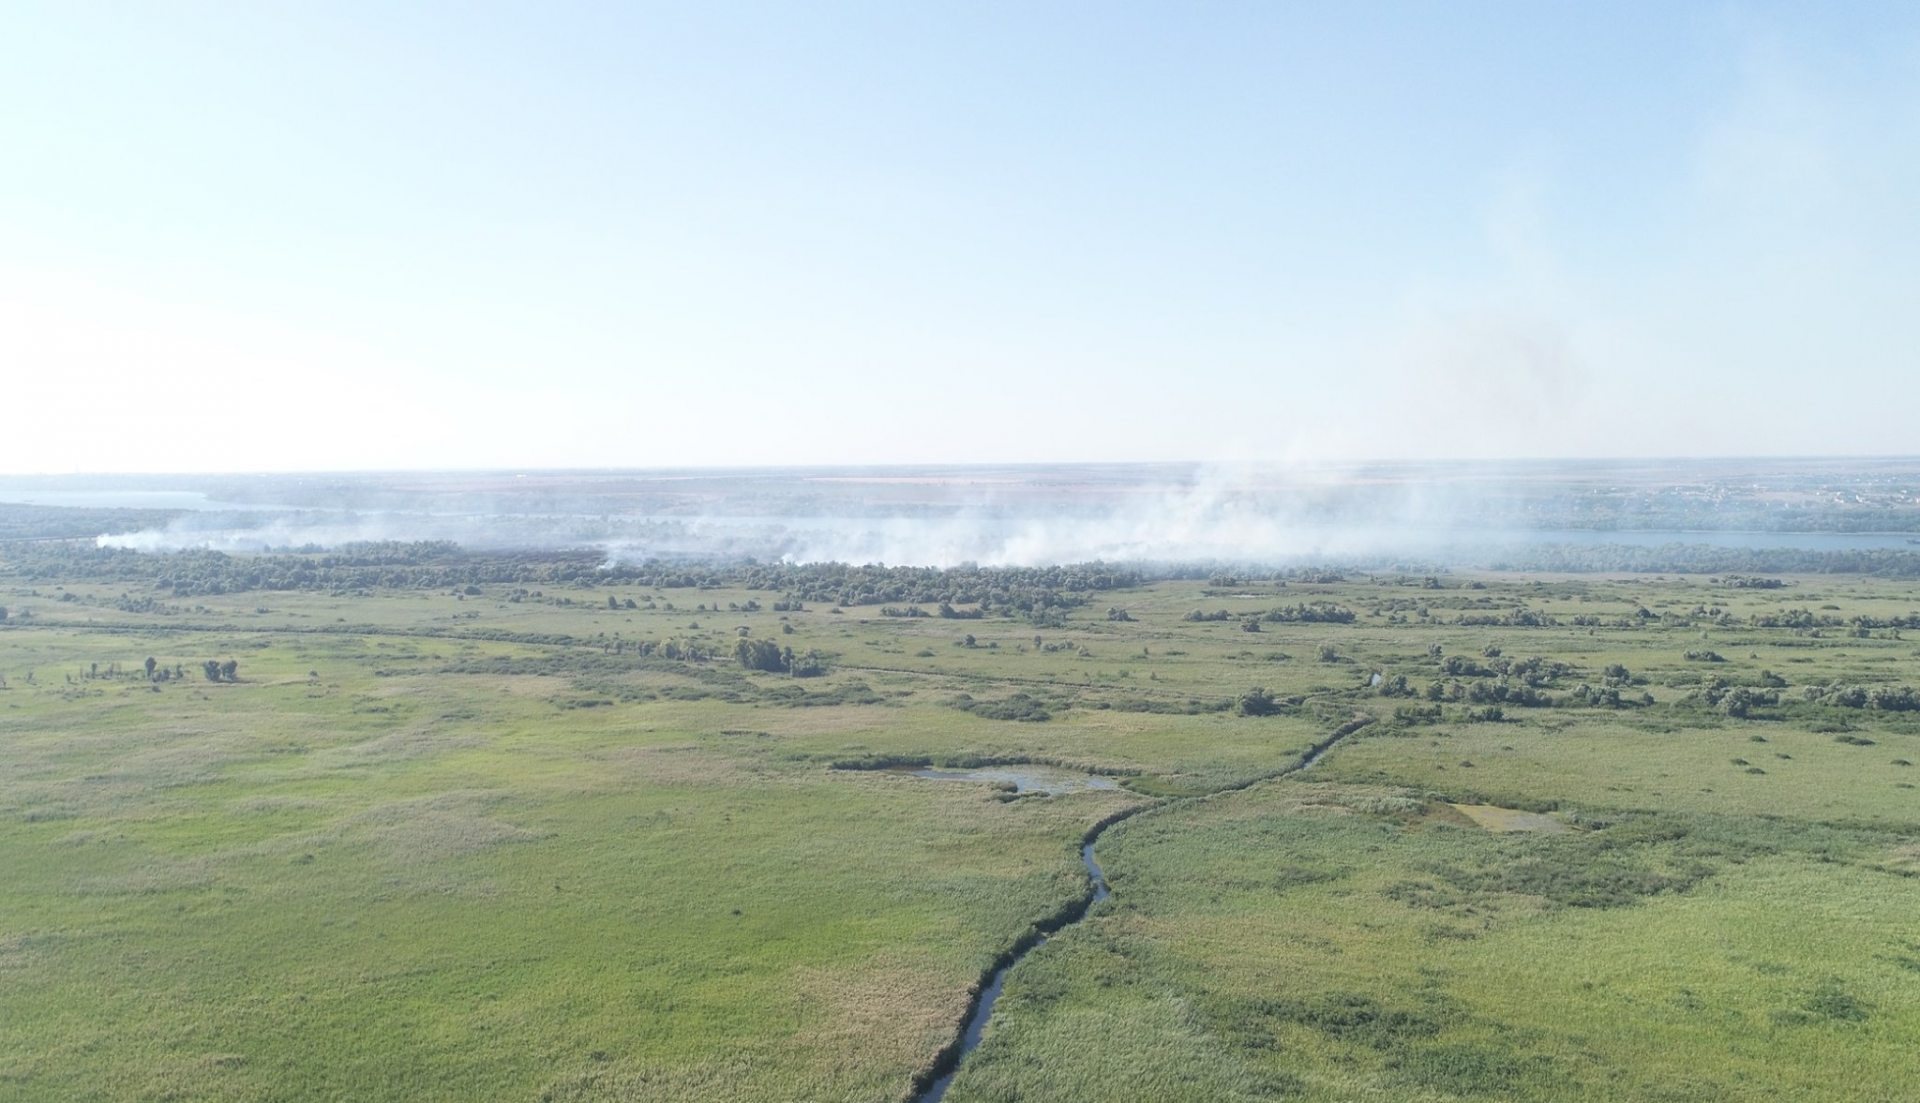 На Херсонщине сгорел дачный дом на левом берегу Днепра